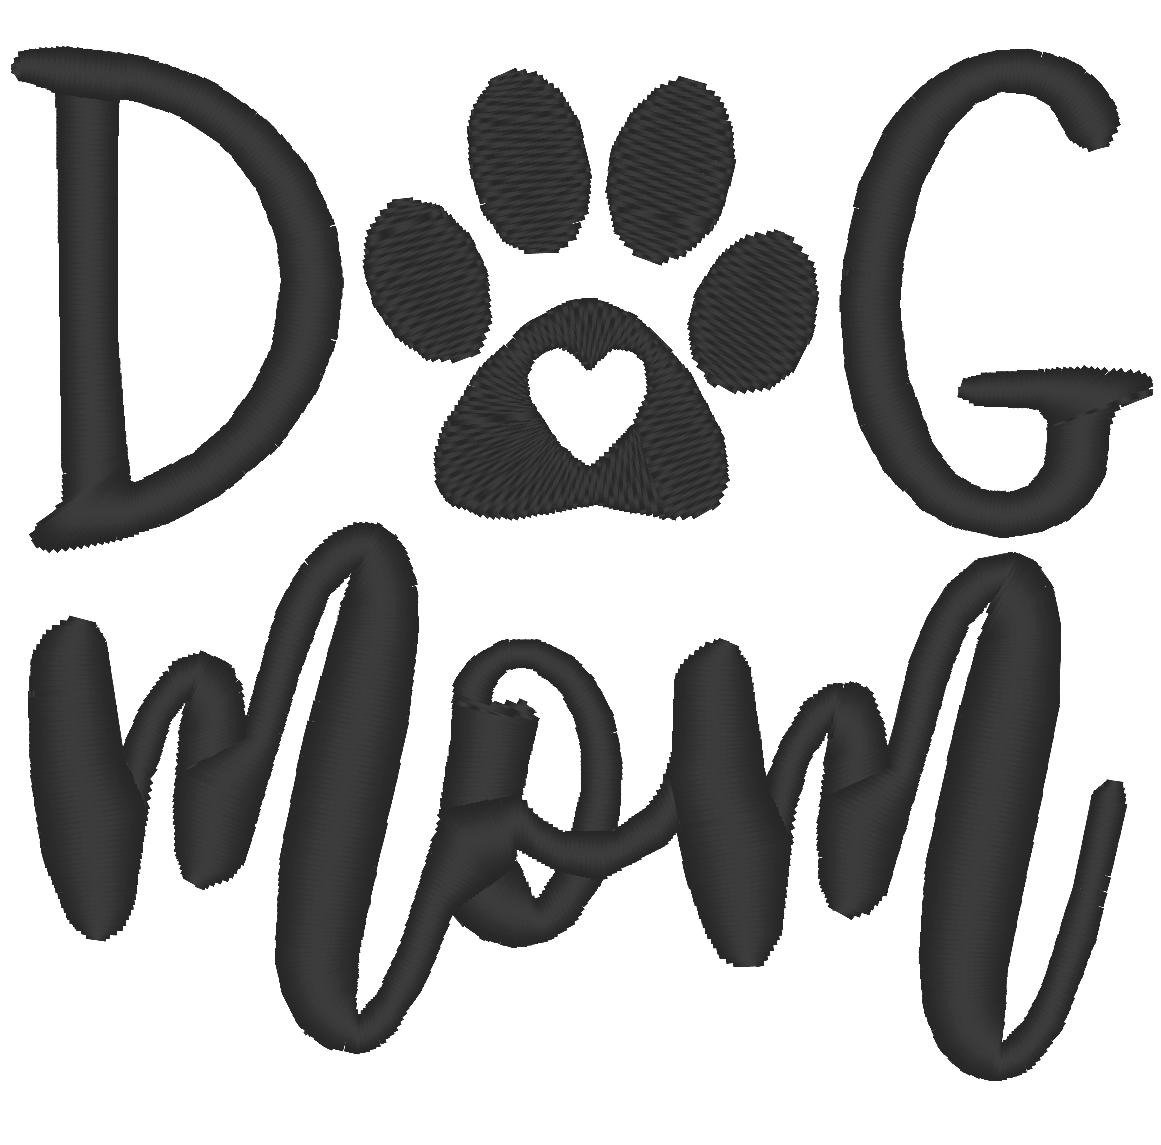 Dog_Mom_Schrift2-001